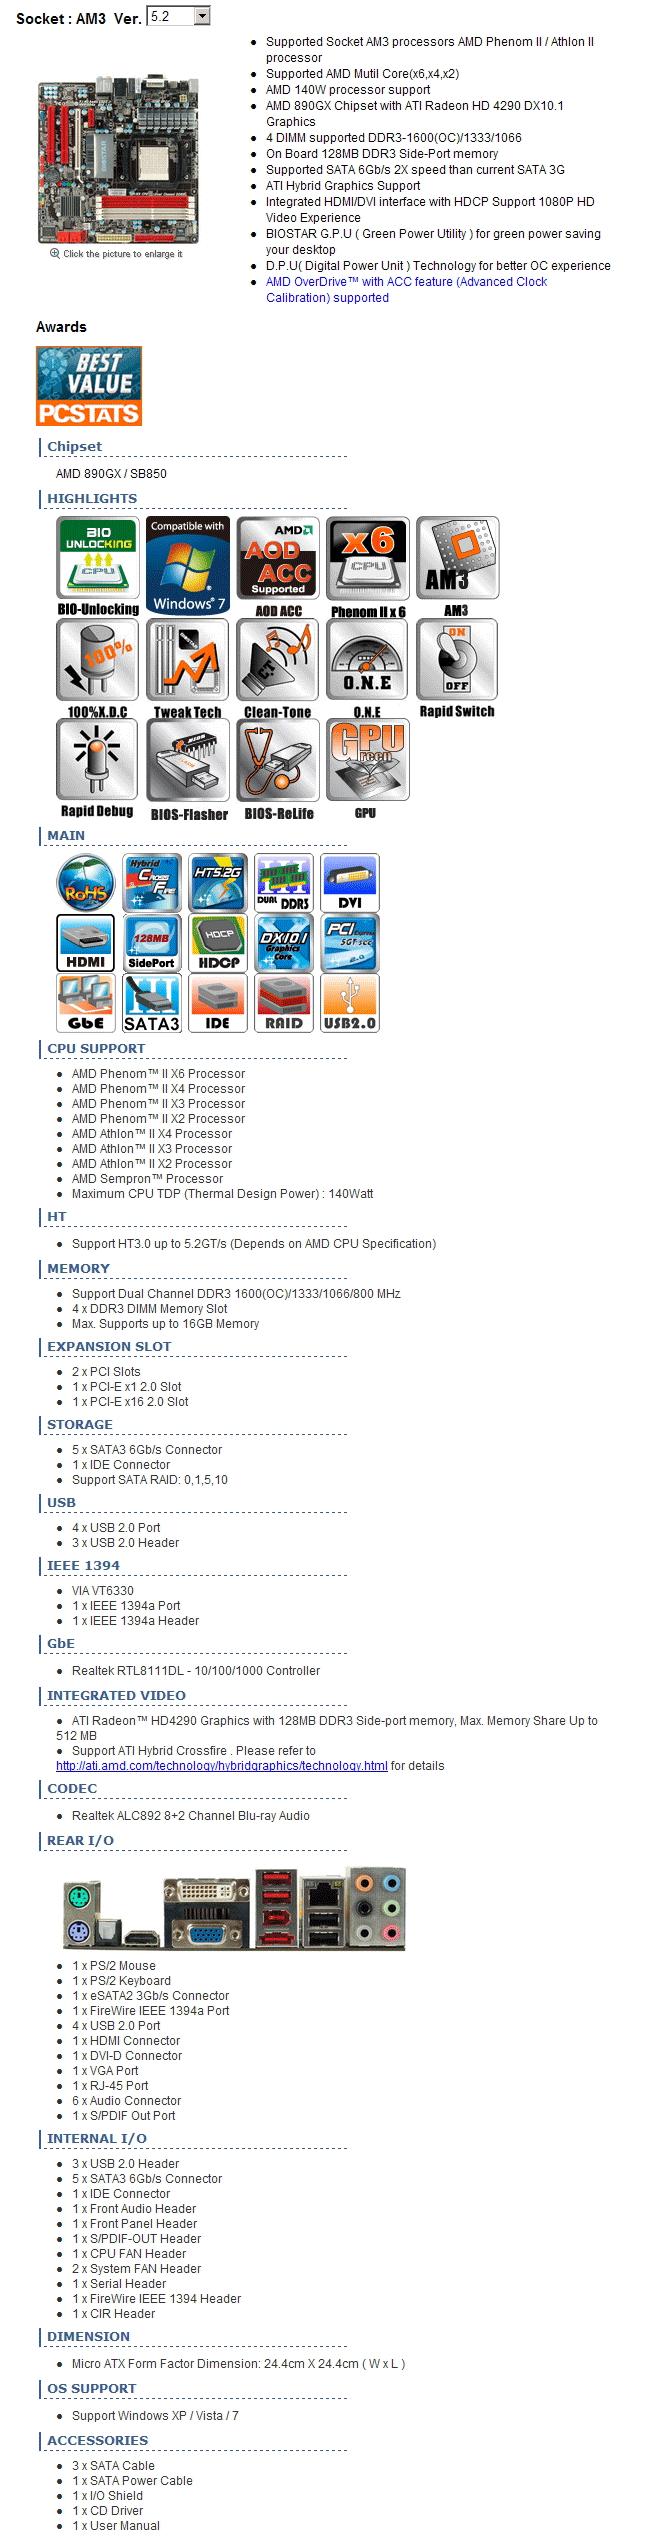 ta890gxe specific Biostar TA890GXE [Ver 5.2]